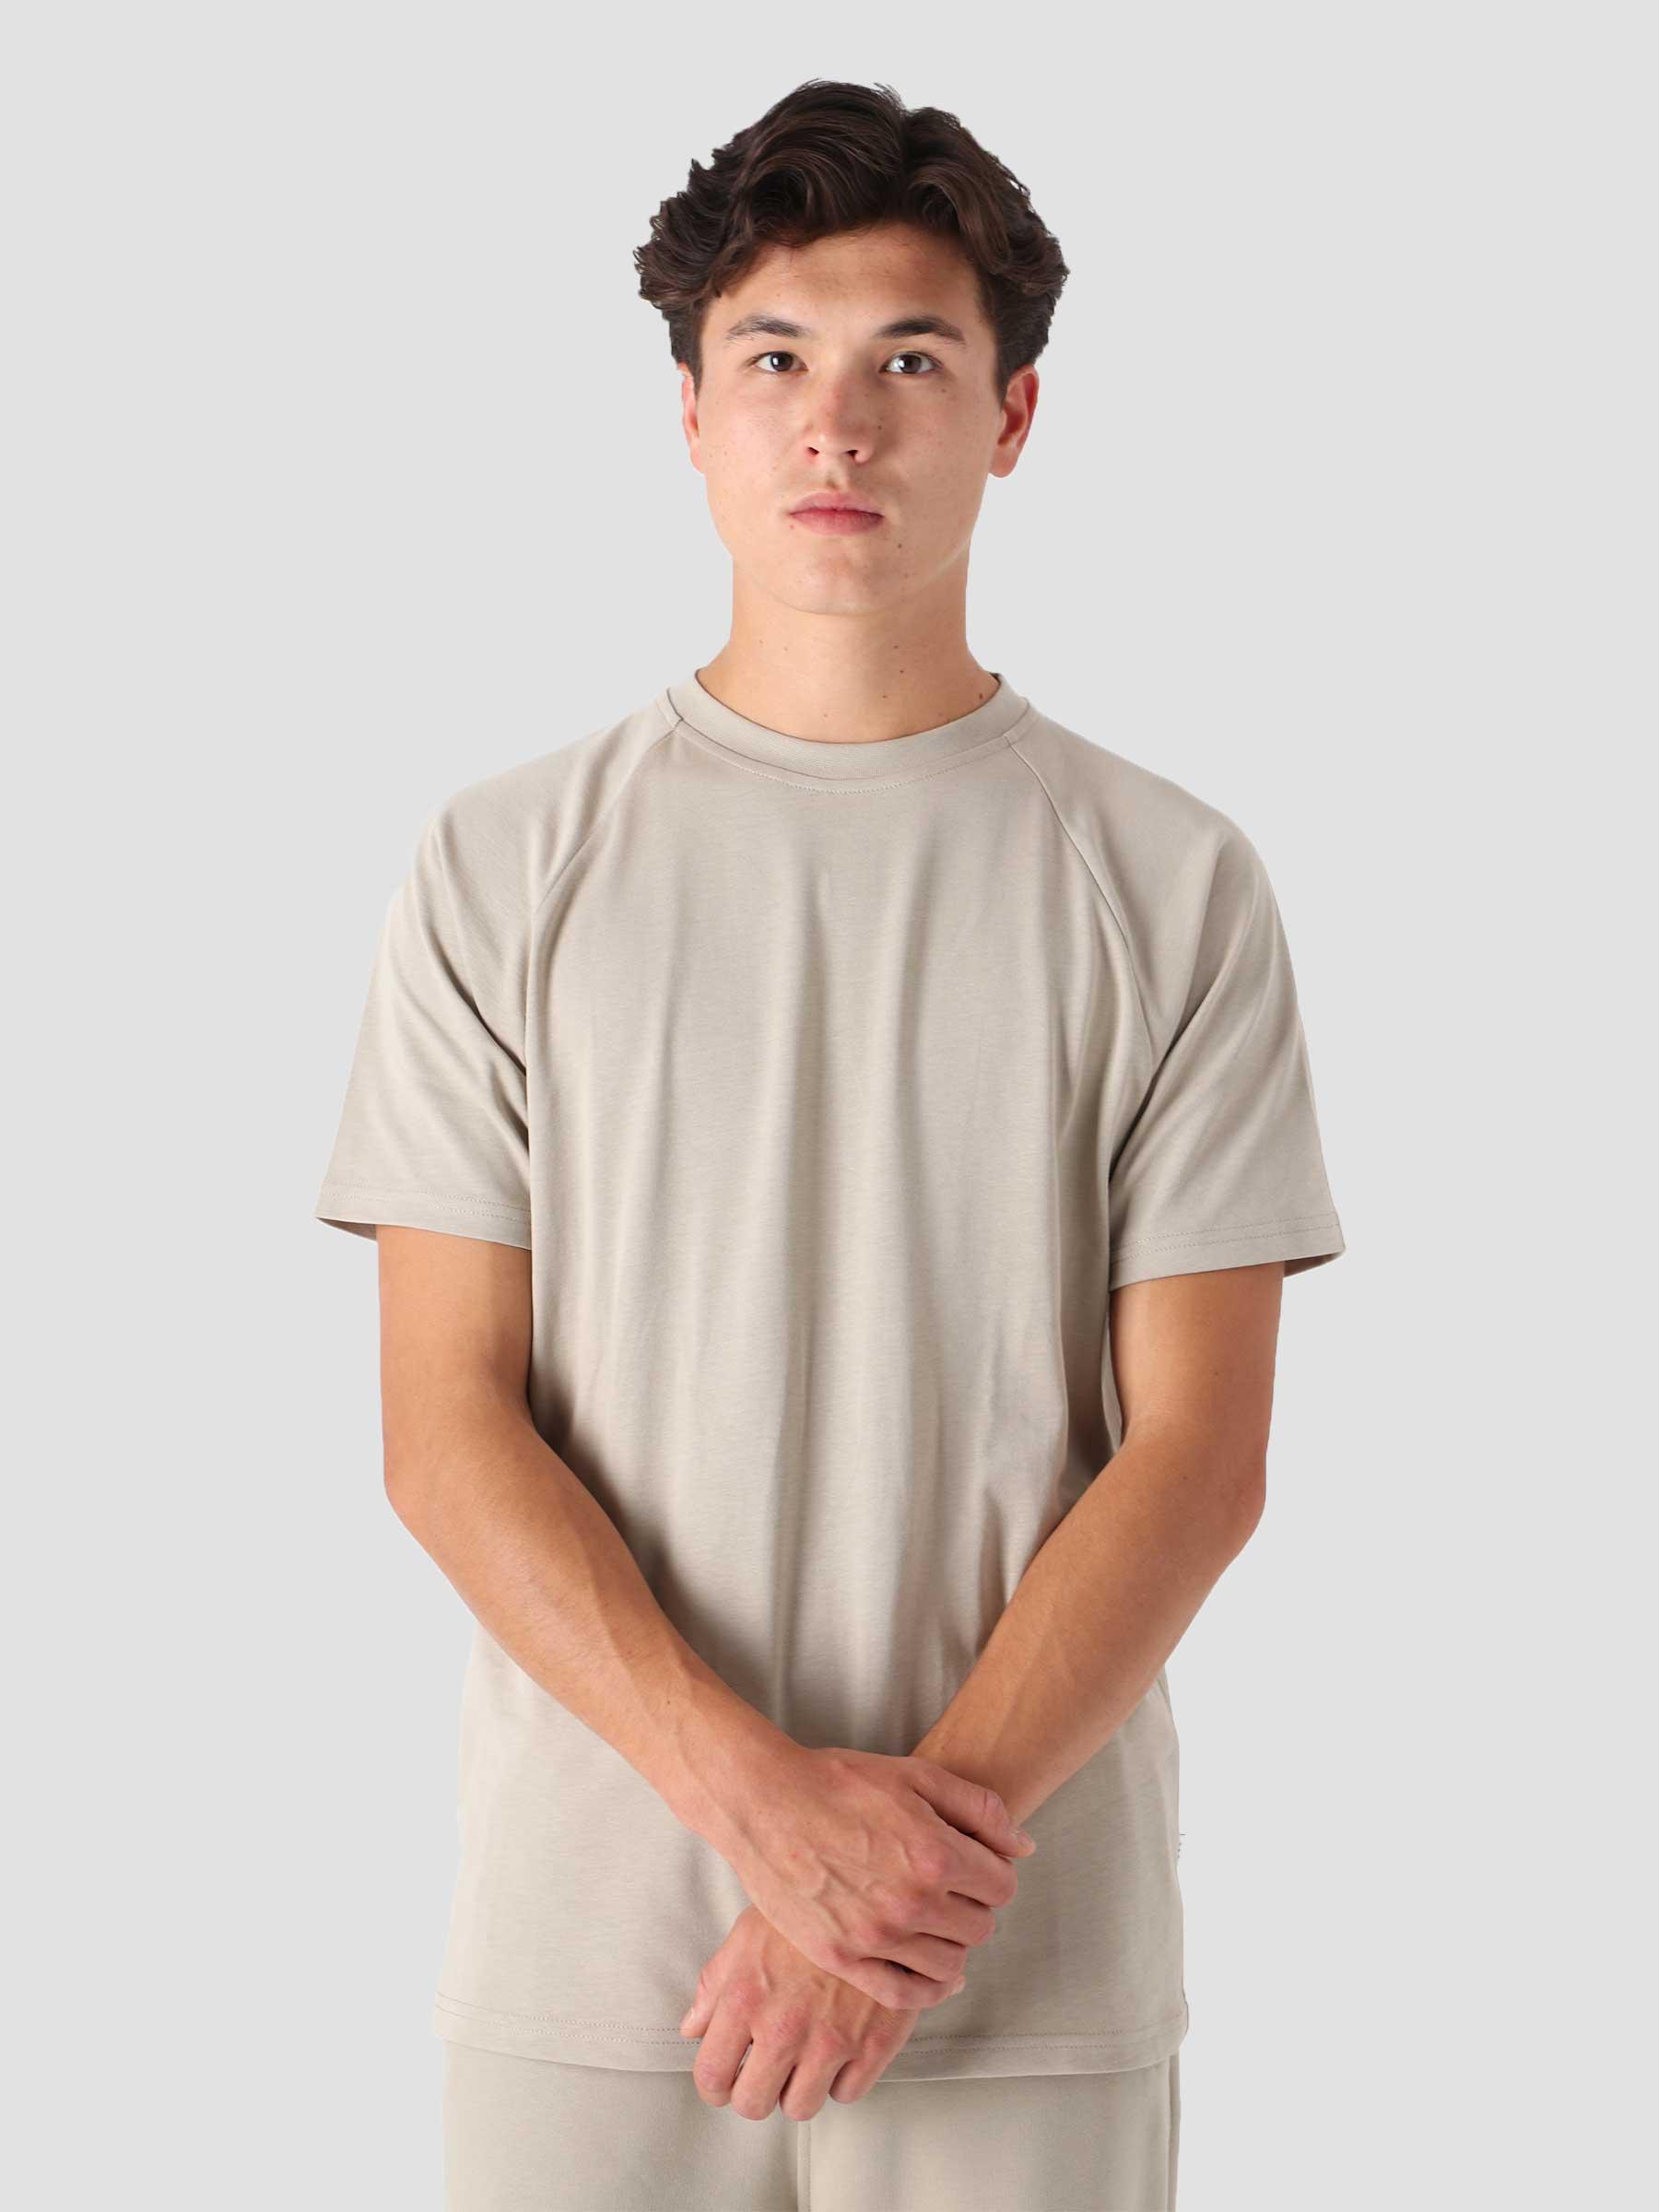 QB302 Raglan T-shirt Stone